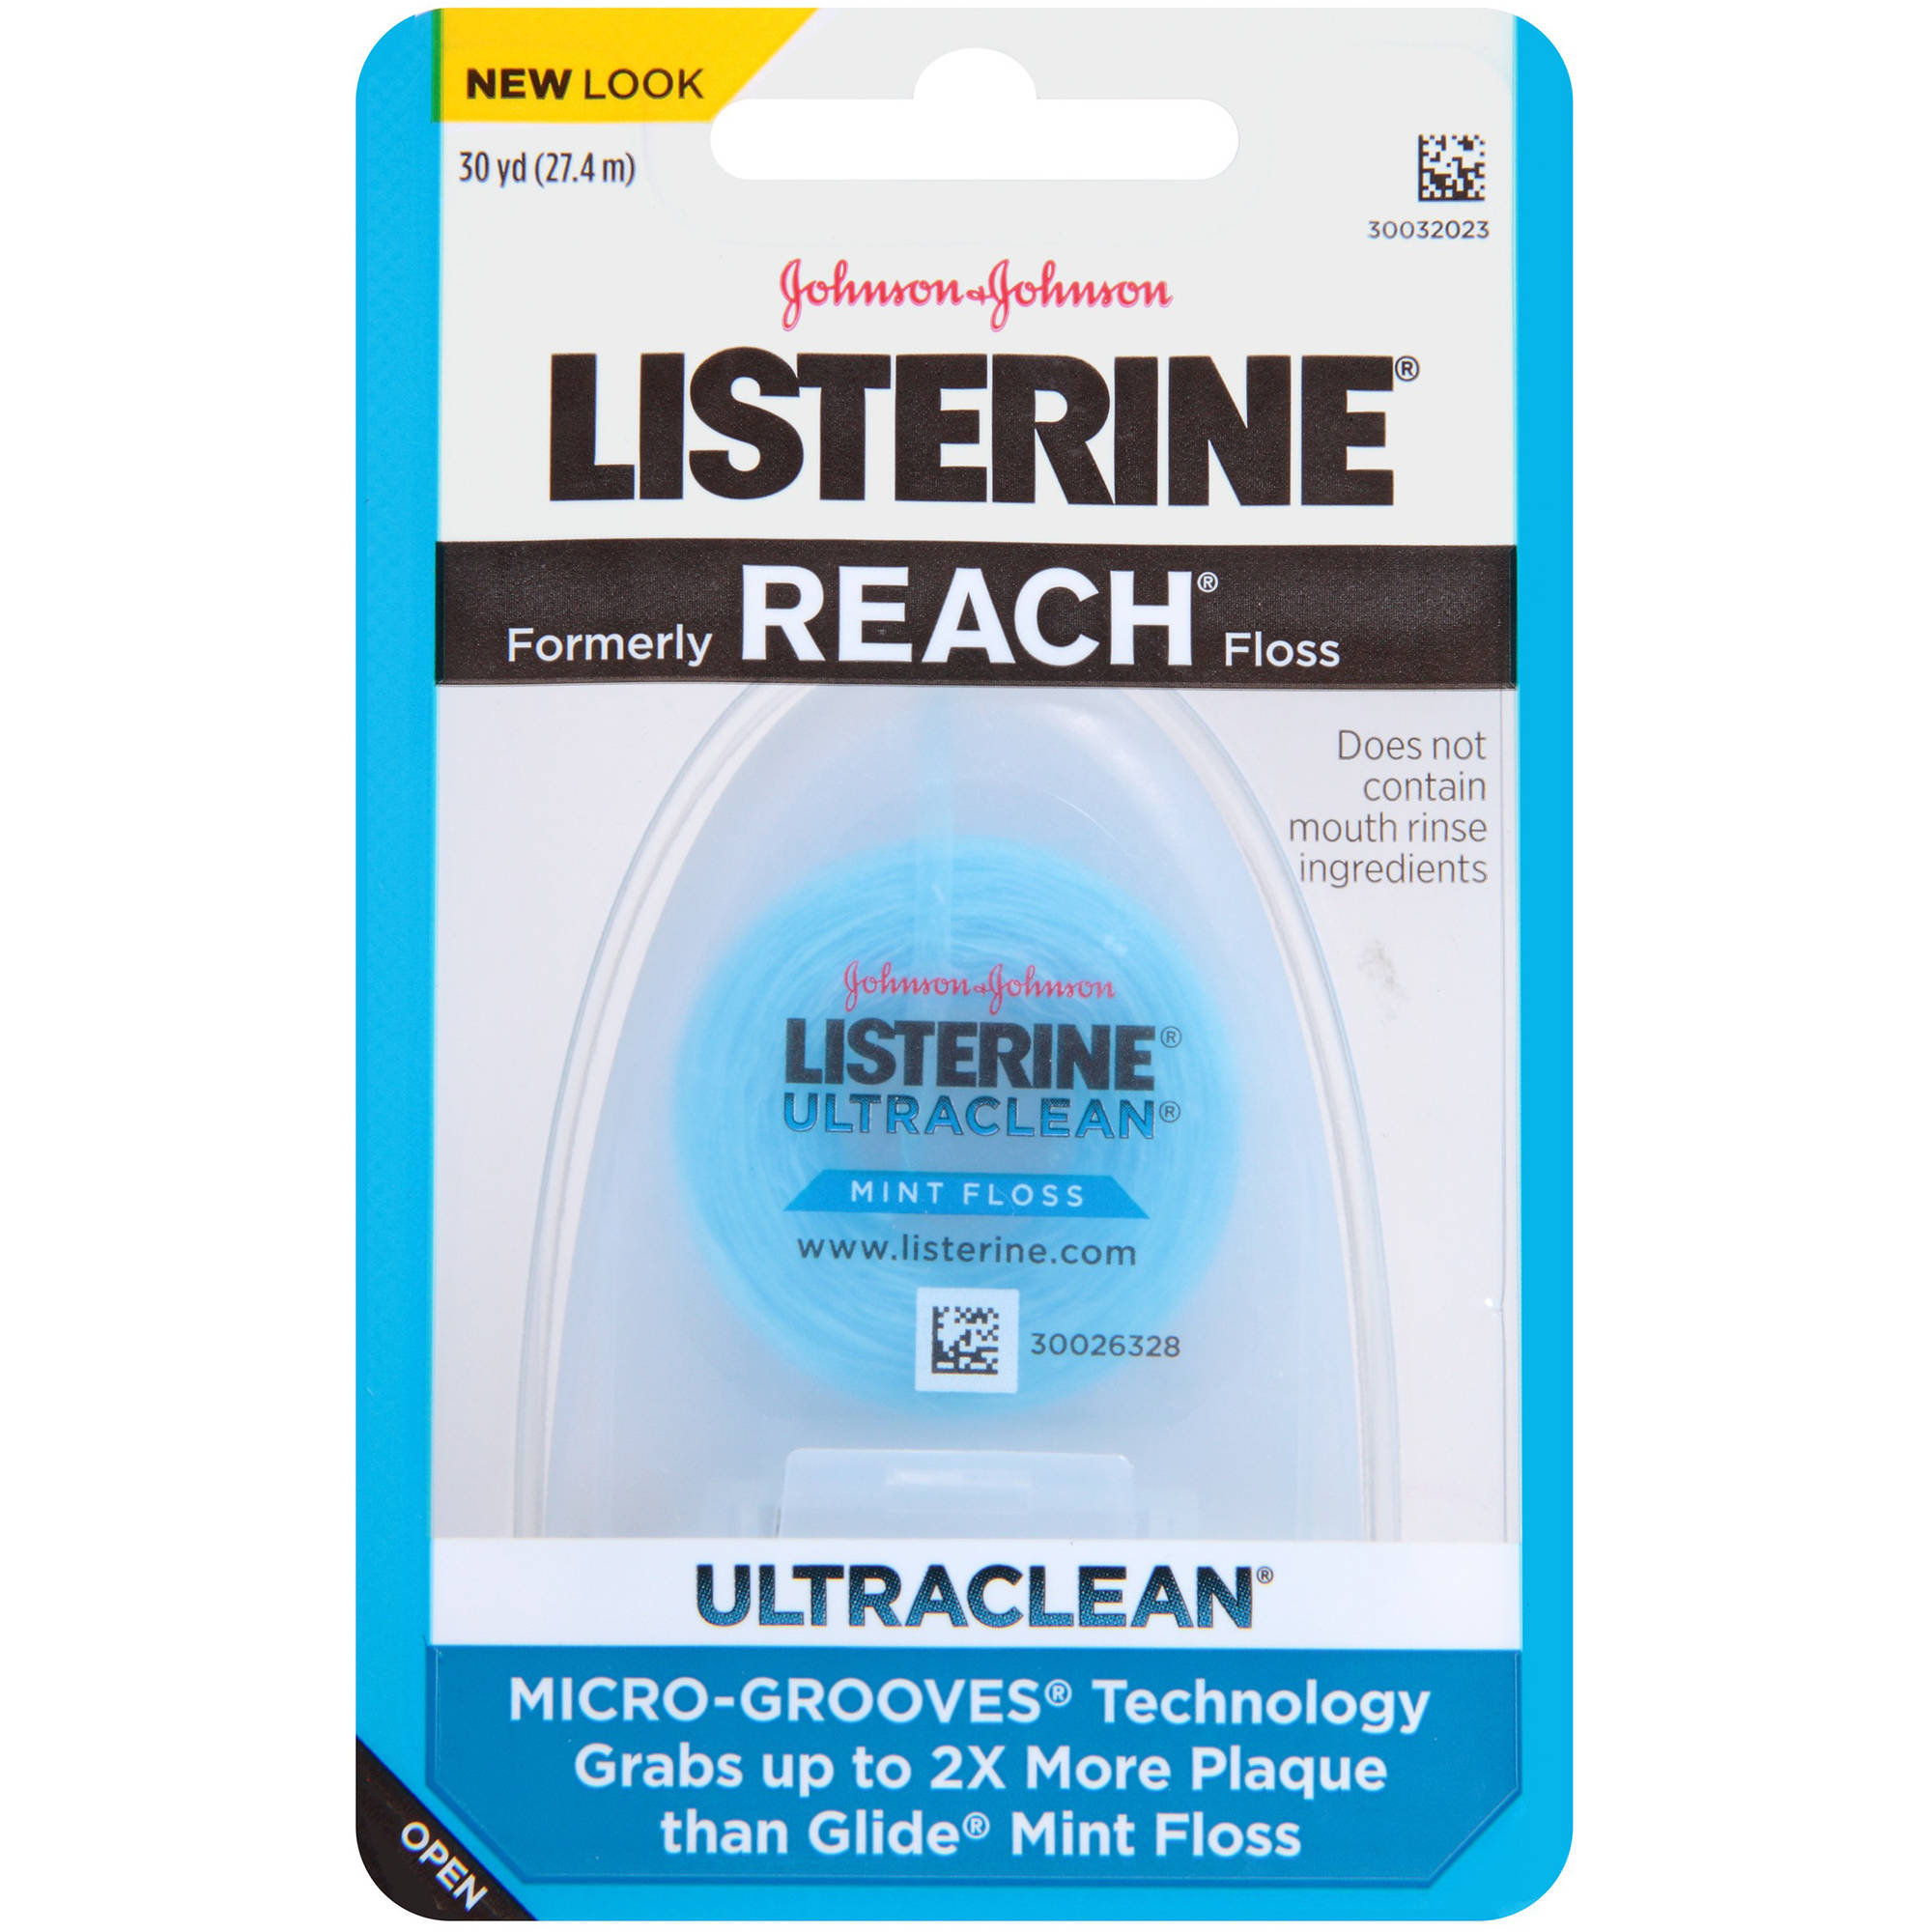 Listerine UltraClean Floss, Mint, 30 Yards